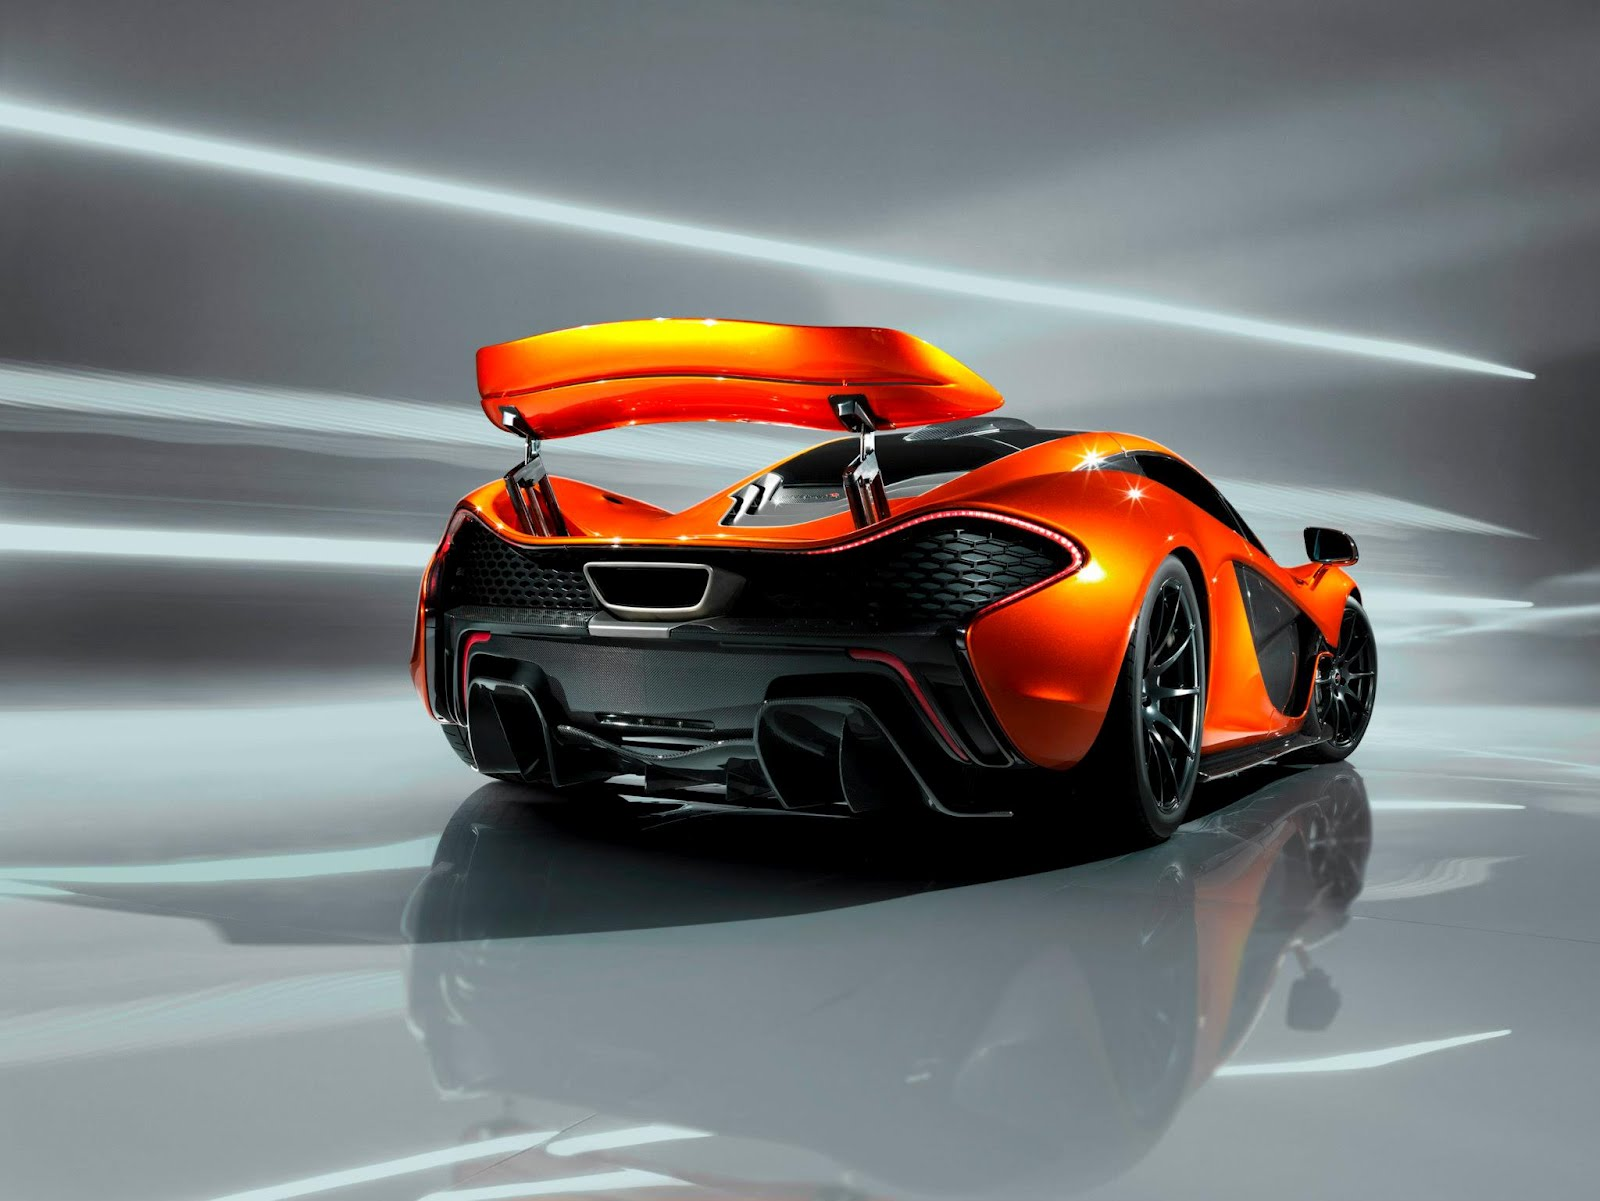 the mclaren p1 hybrid supercar unveiled @ paris motorshowron